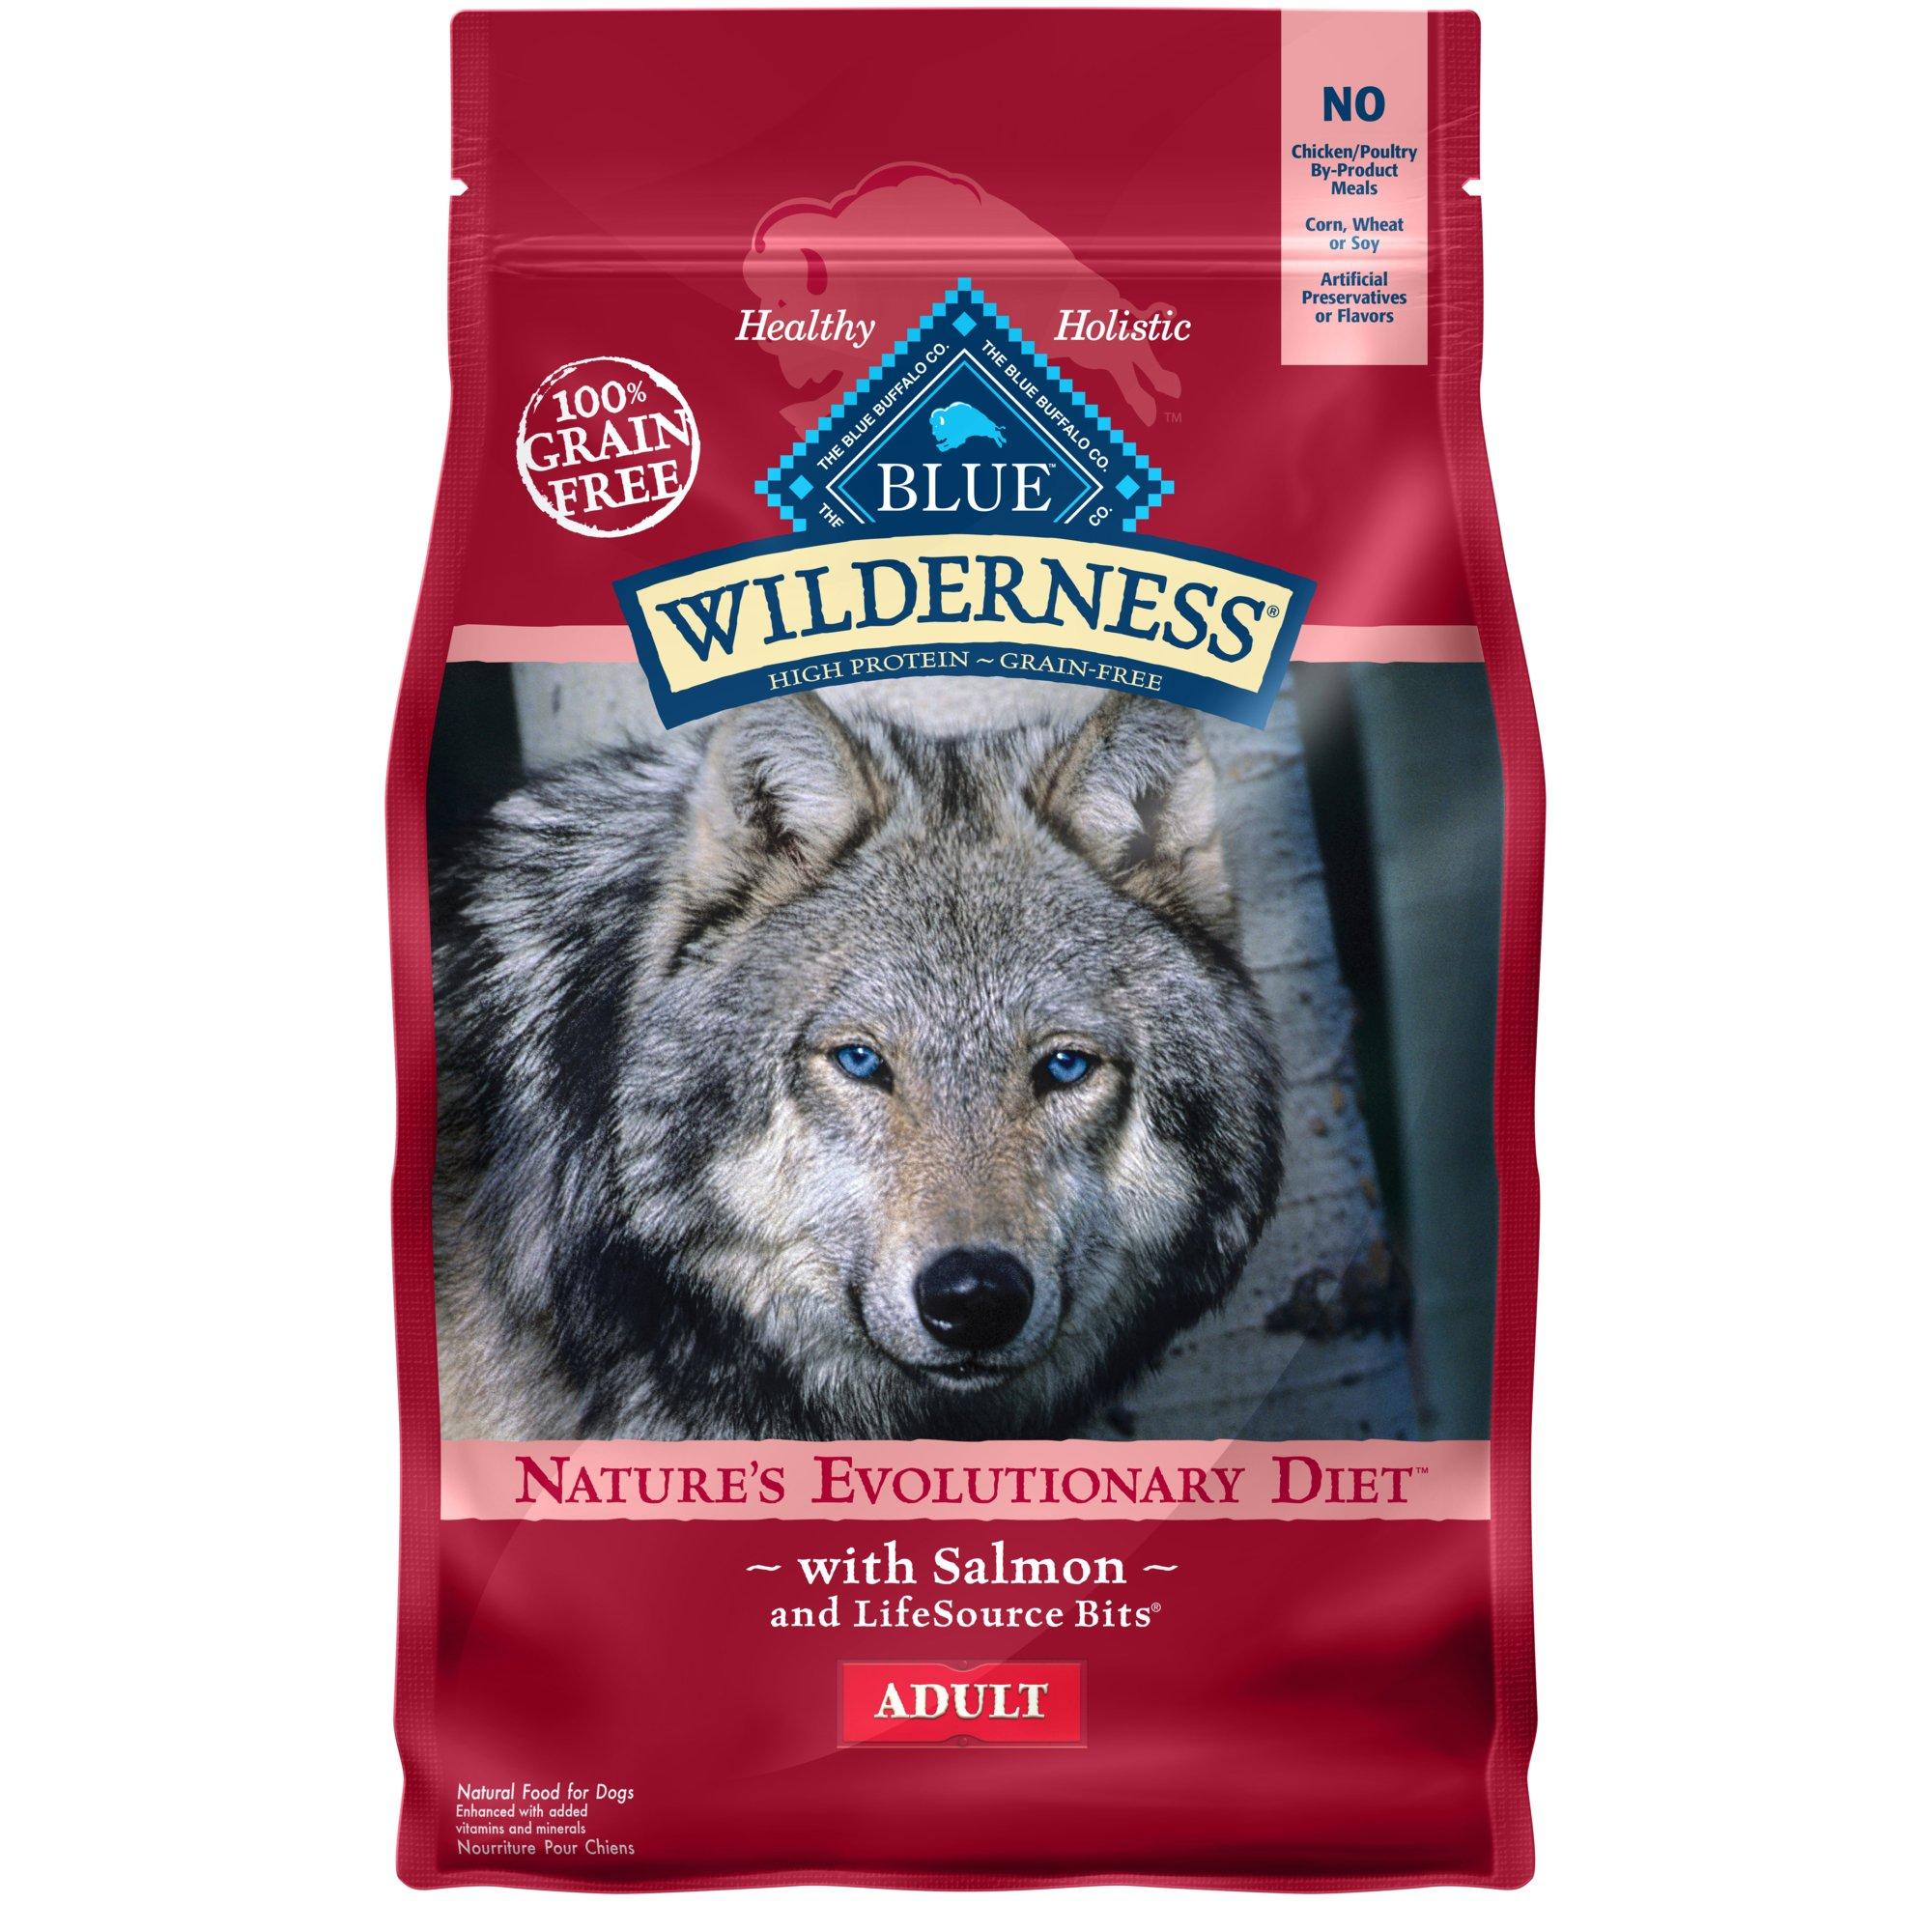 Petco Best Dry Dog Food